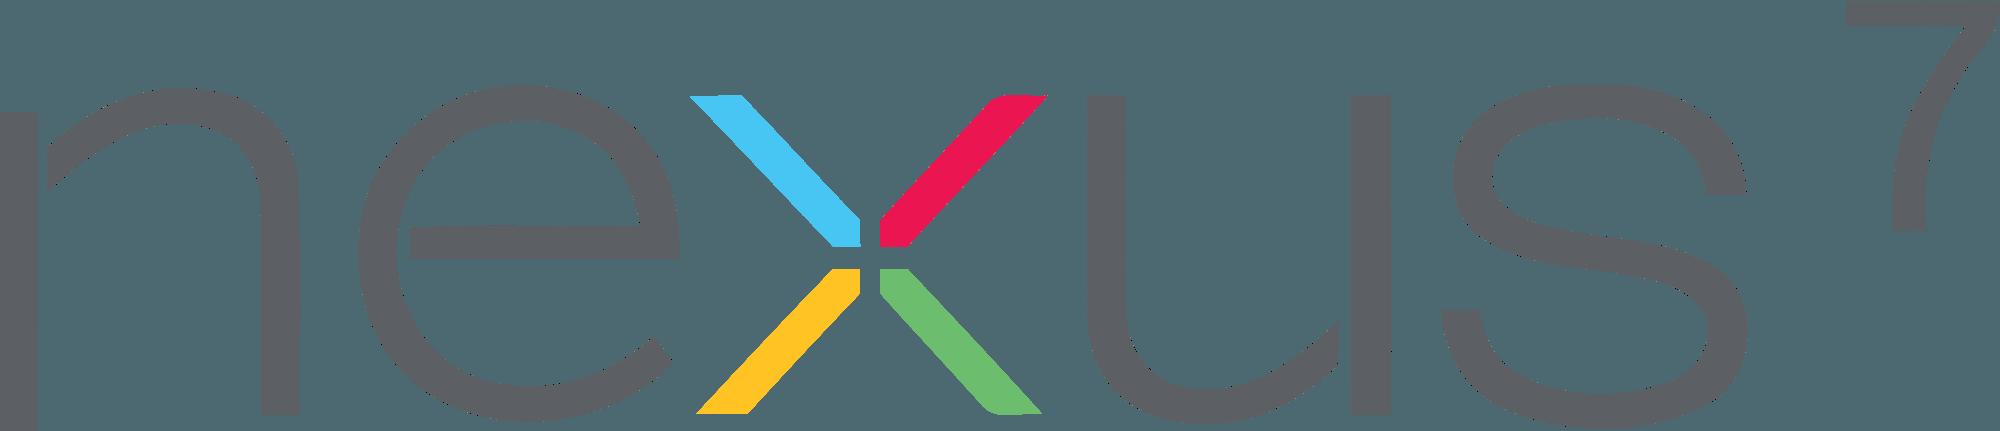 Google Nexus Logo.